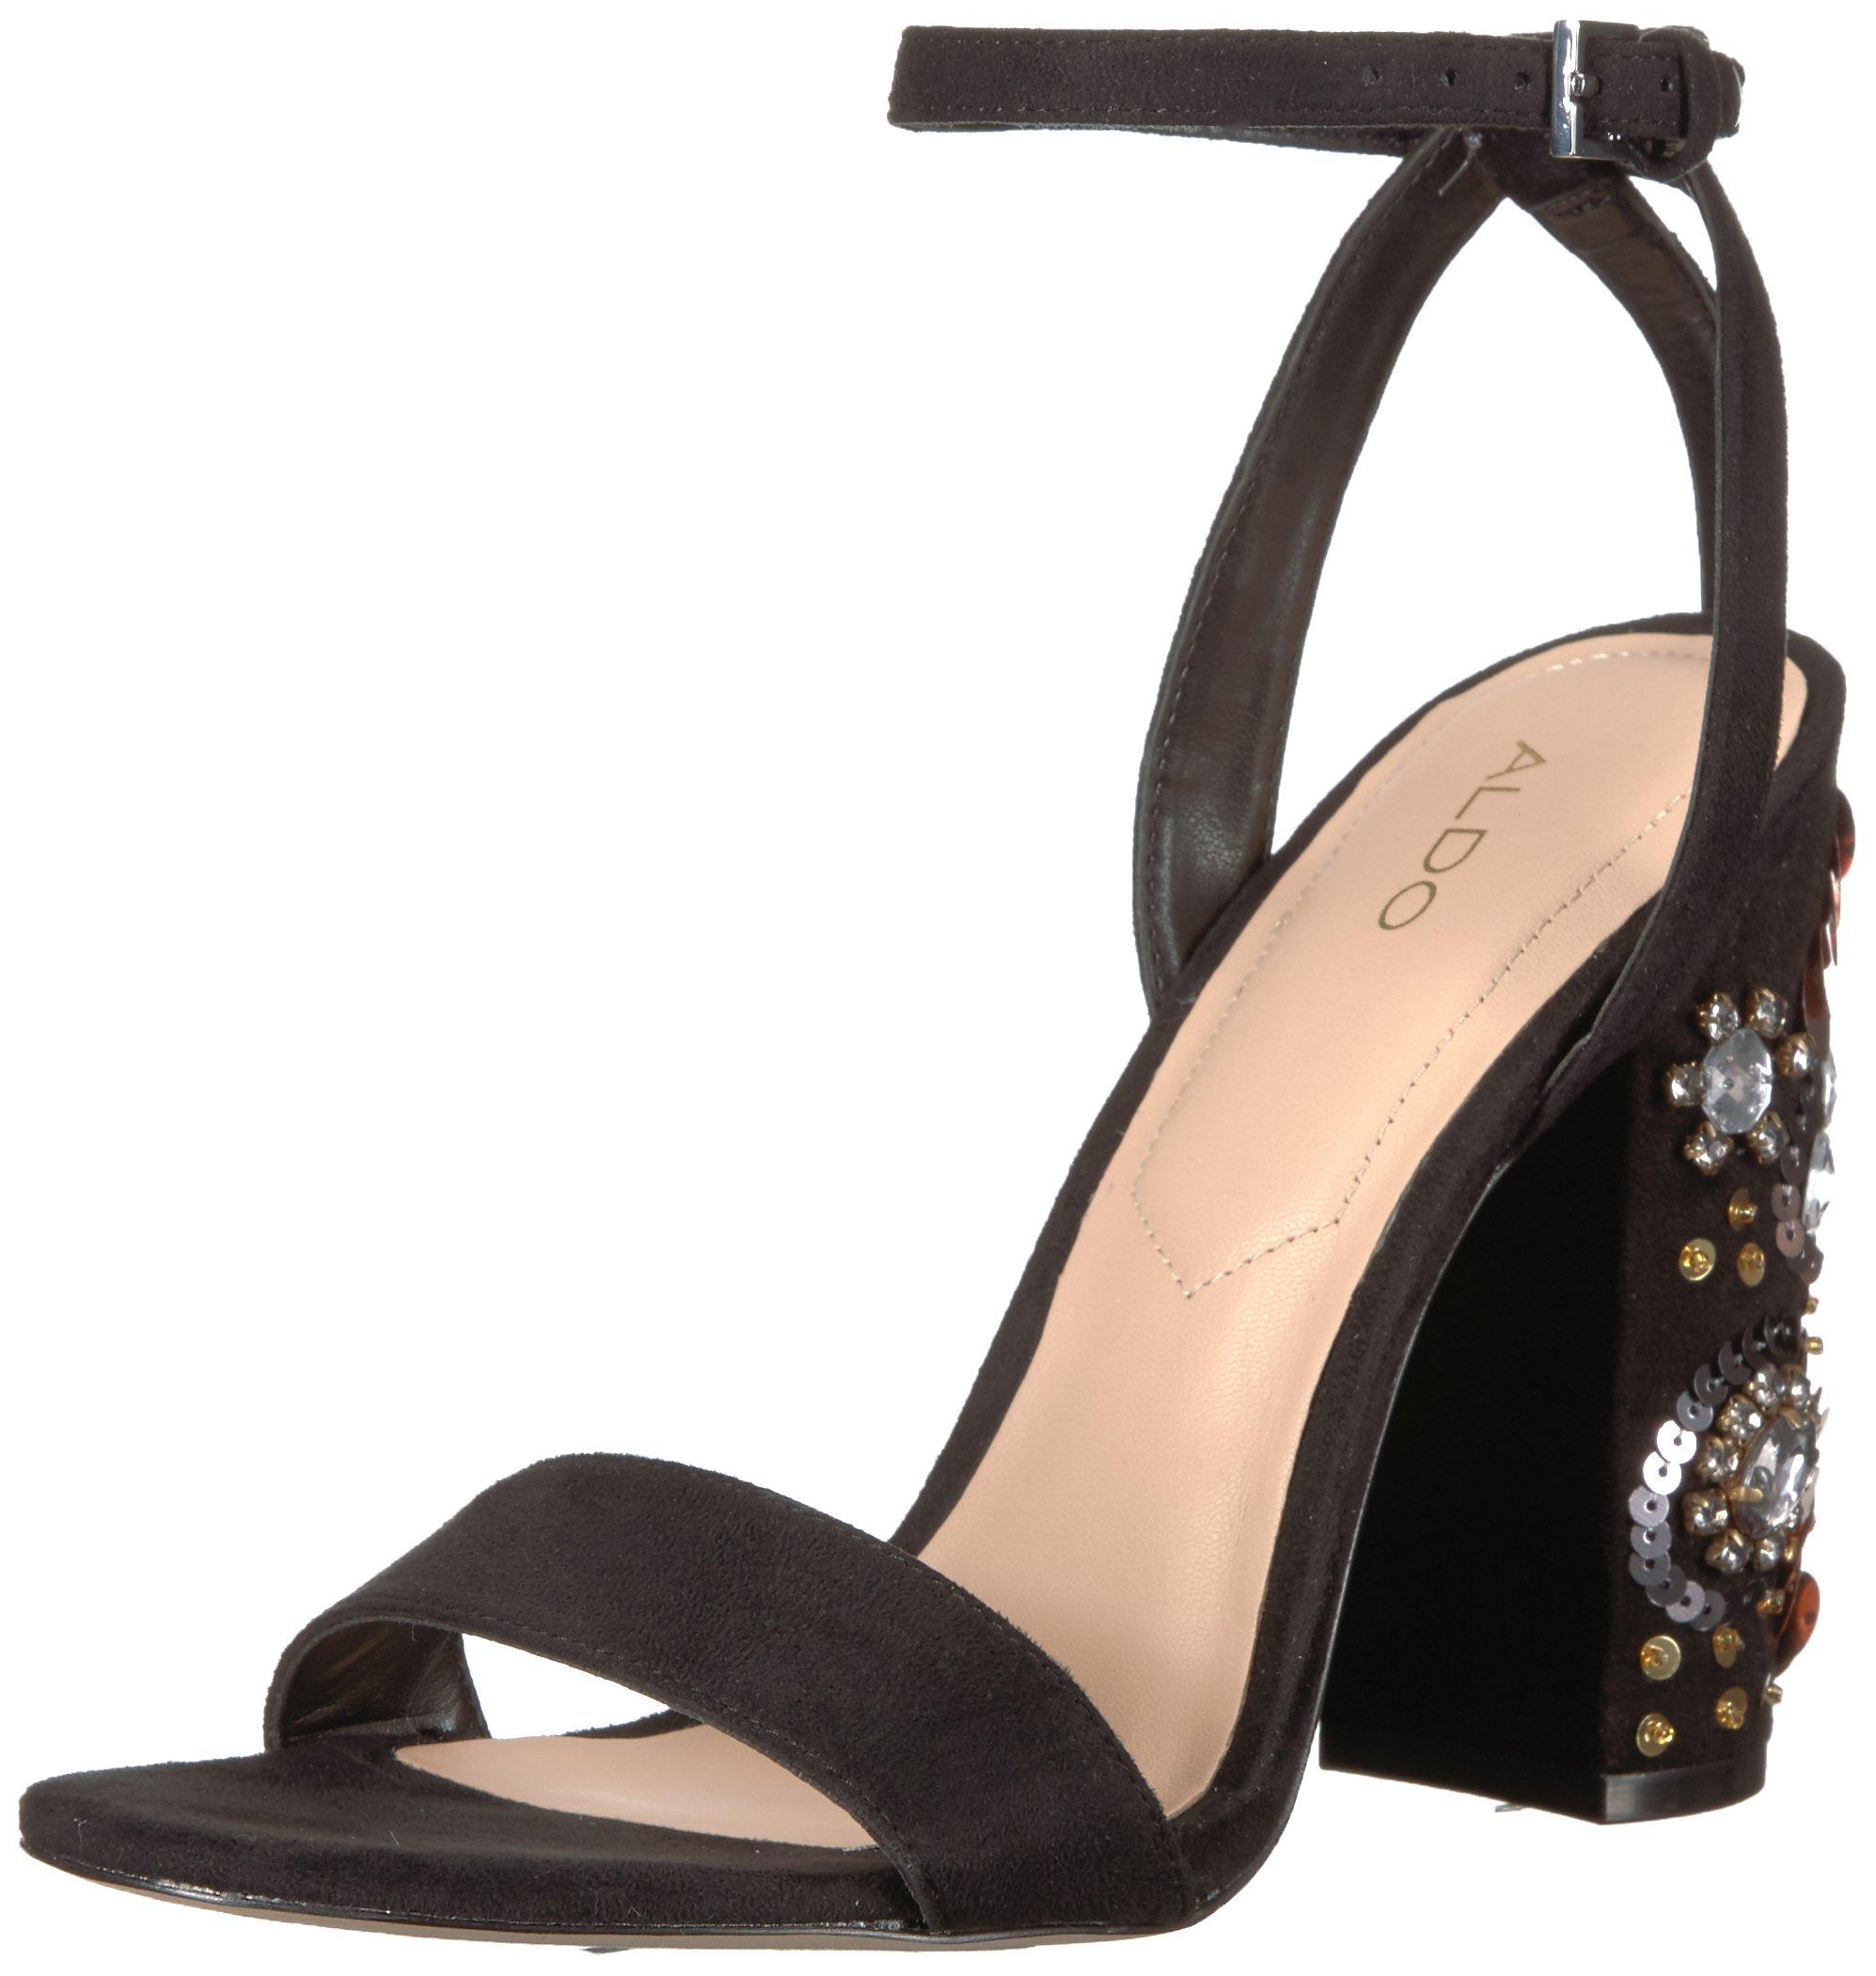 Aldo Women's Luciaa Dress Sandal, Black, 10 B US